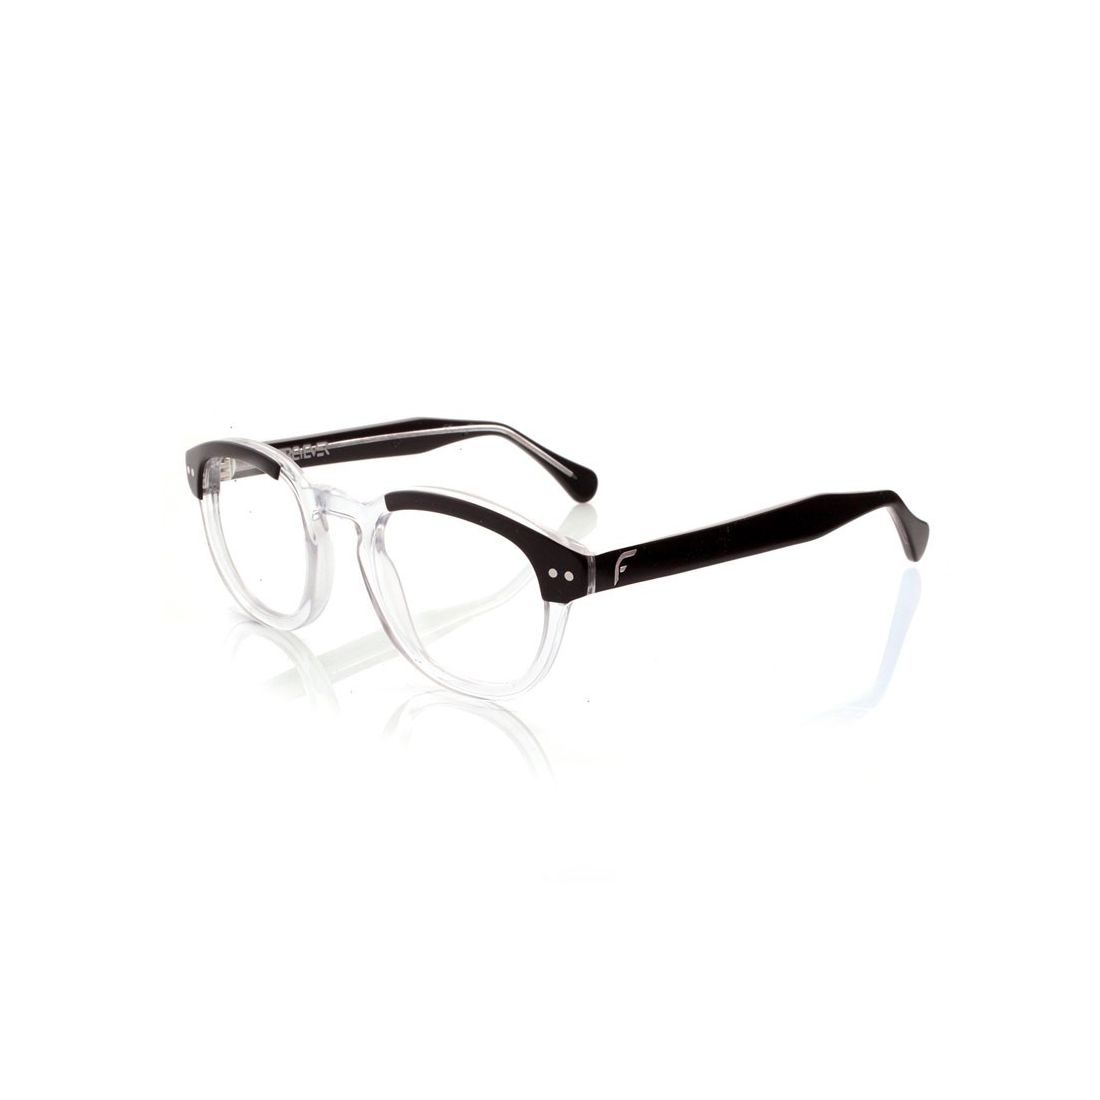 Acetate Frame For Prescription Glasses For Woman Man